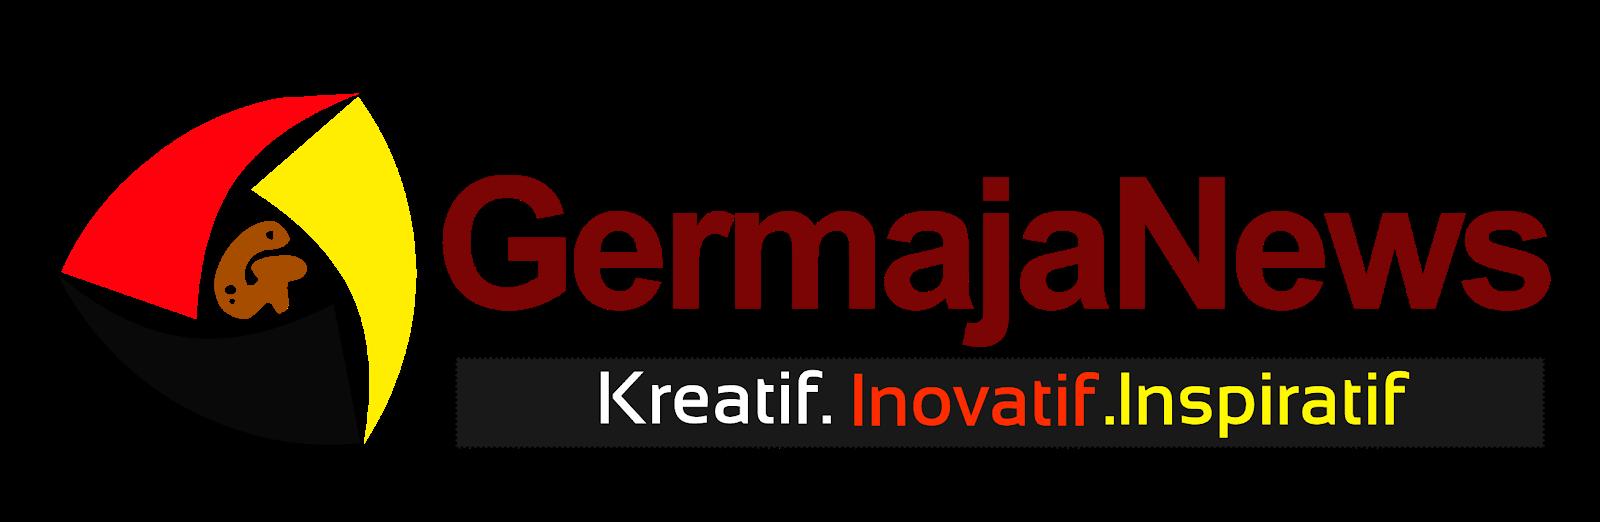 Germajanews.com